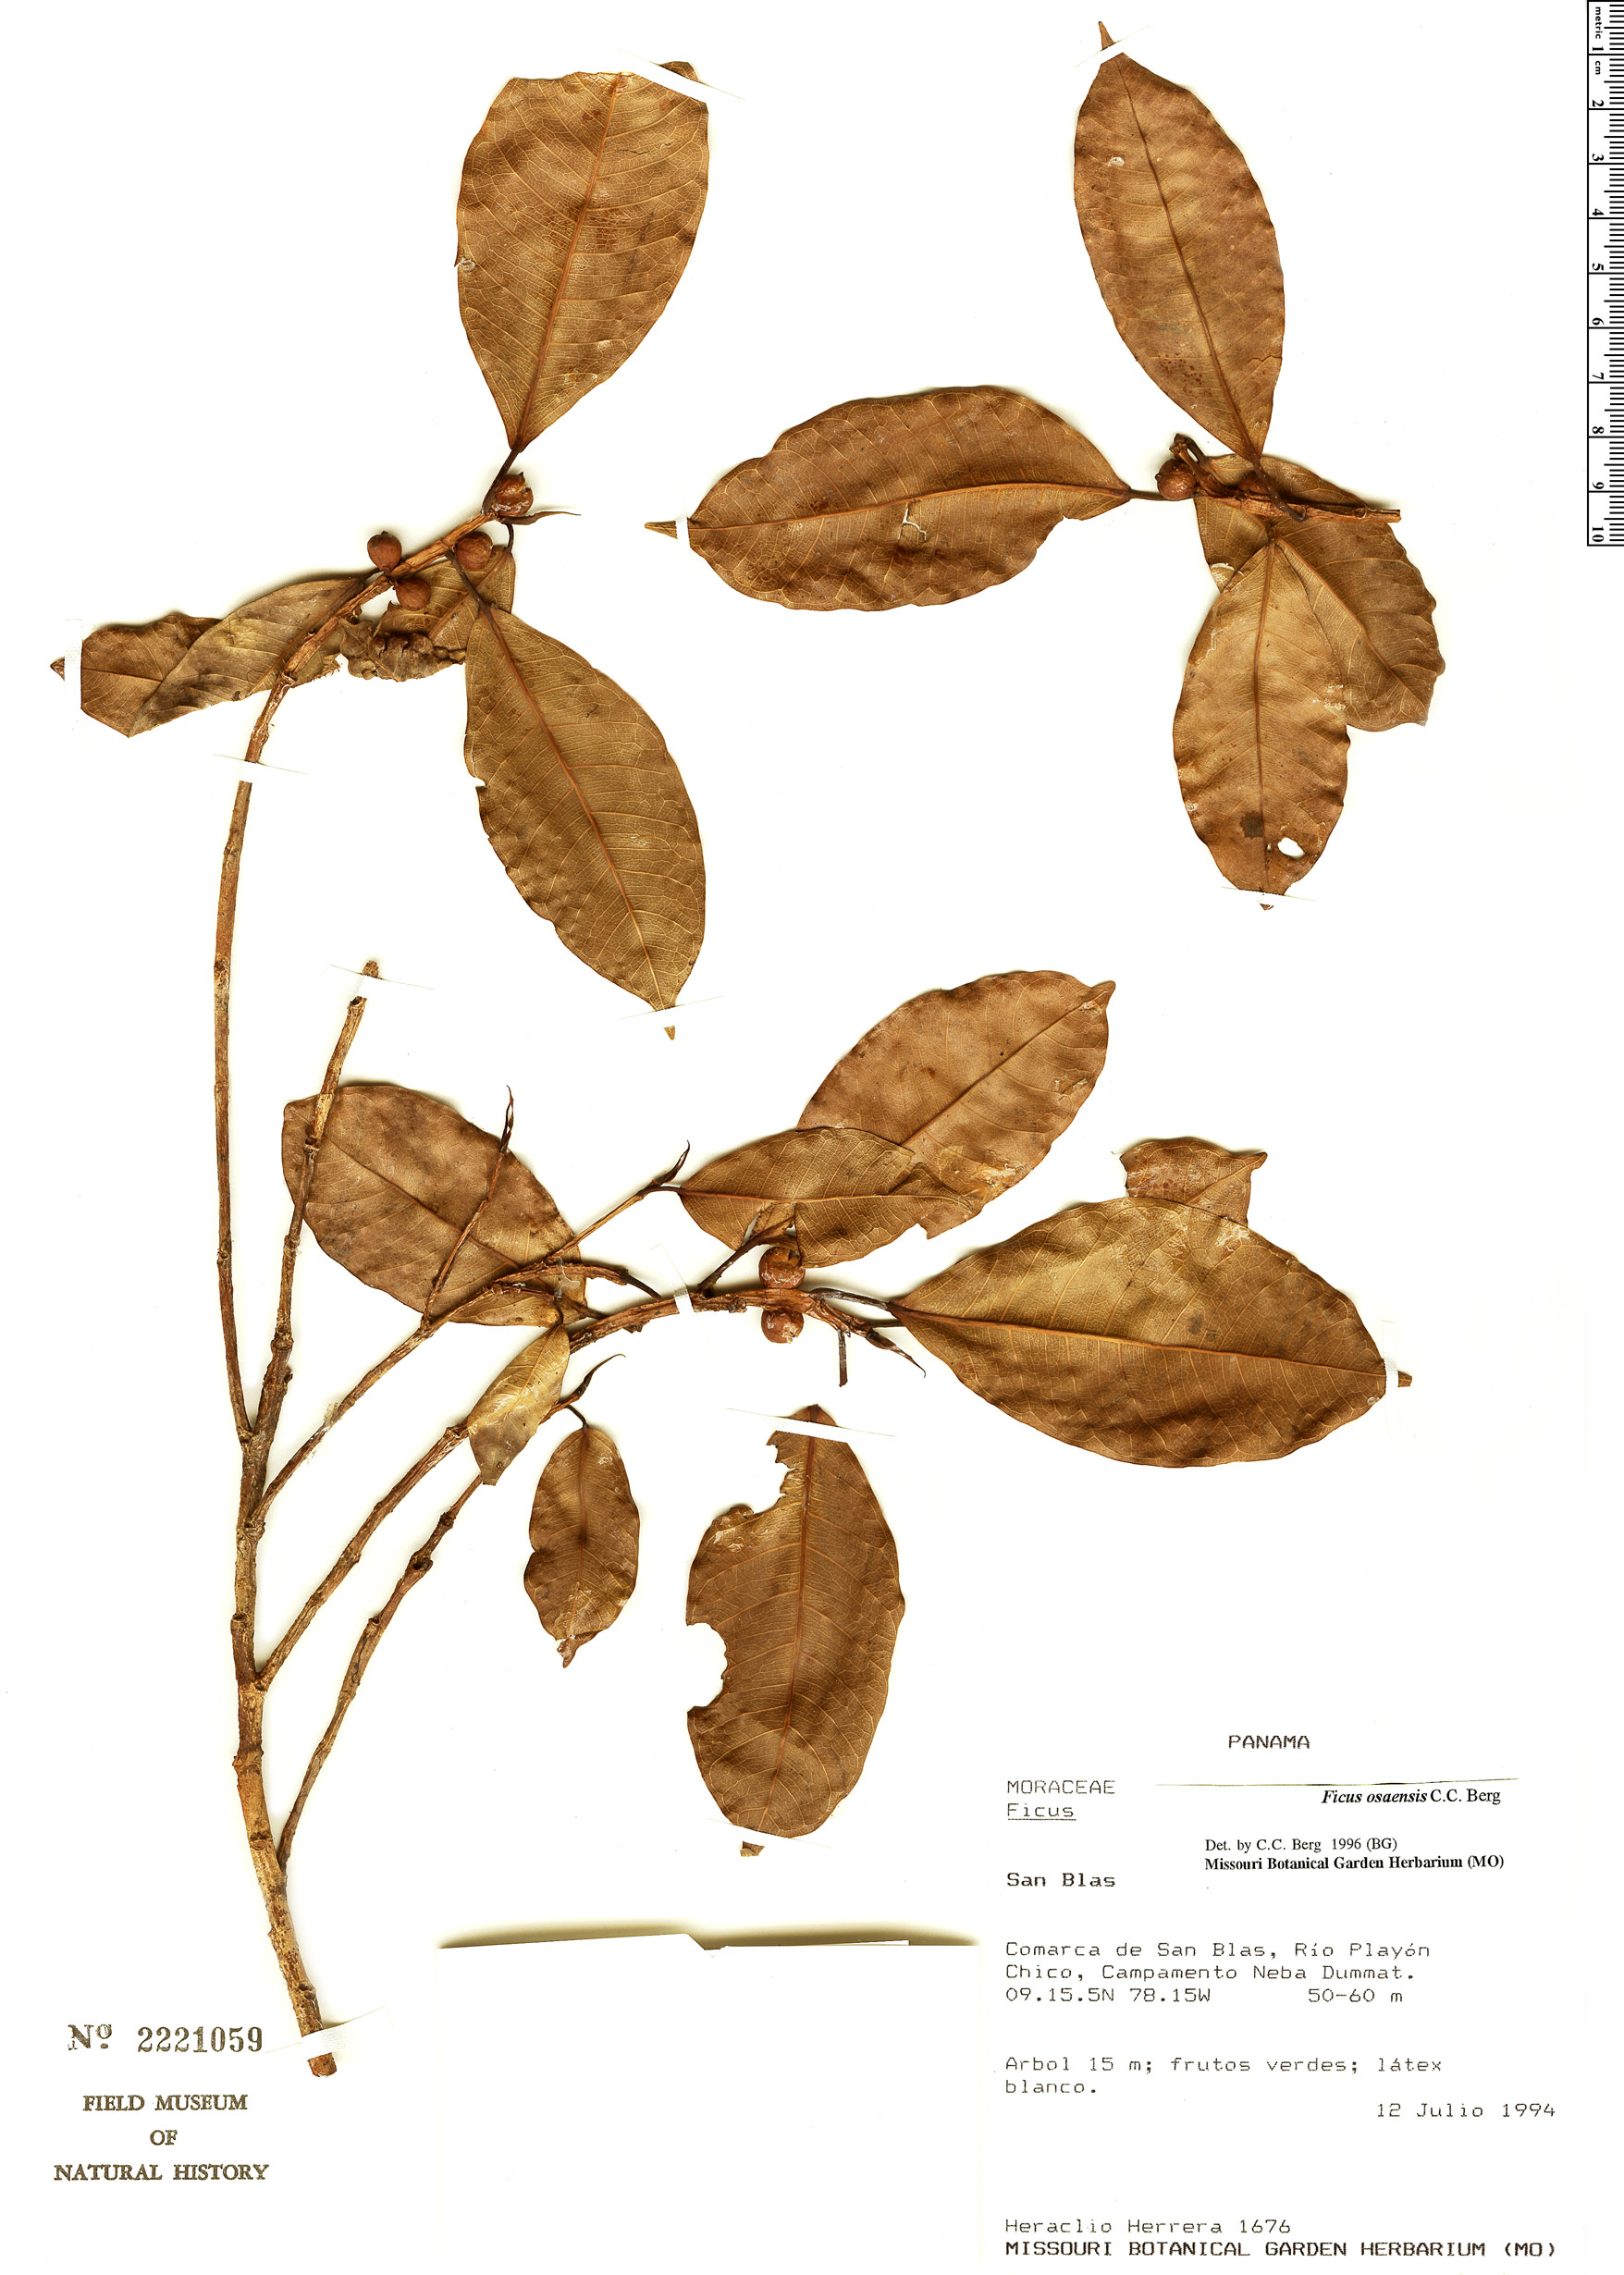 Specimen: Ficus osensis